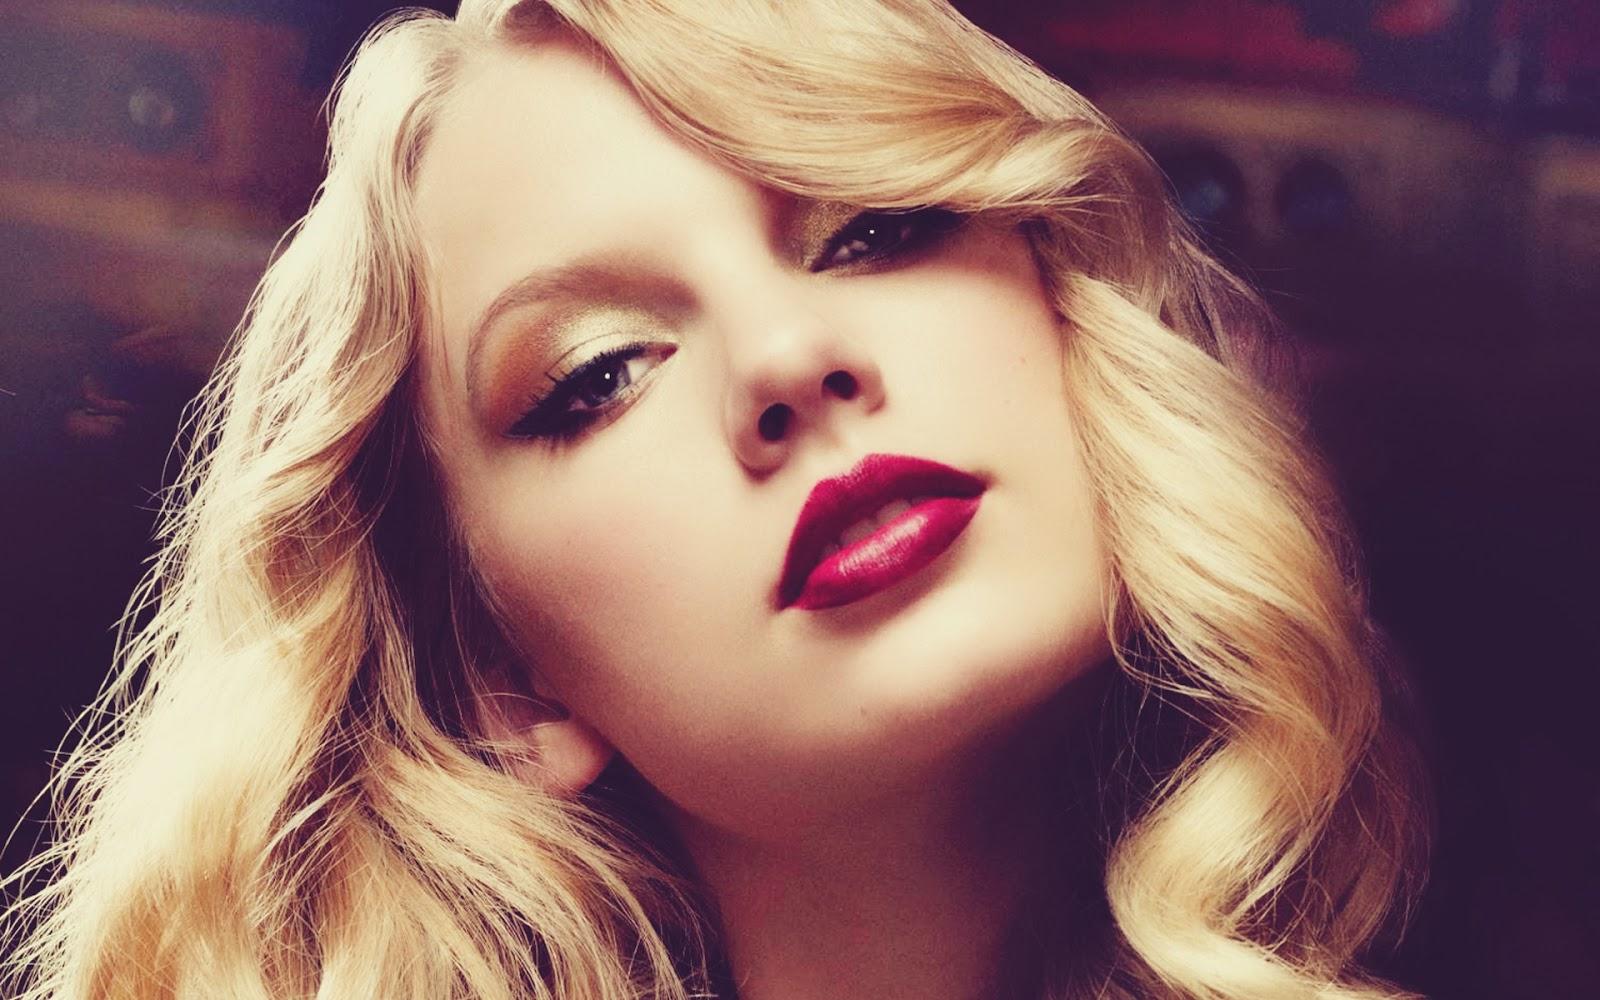 Taylor Swift Usa Hot And Beautiful Women Of The World